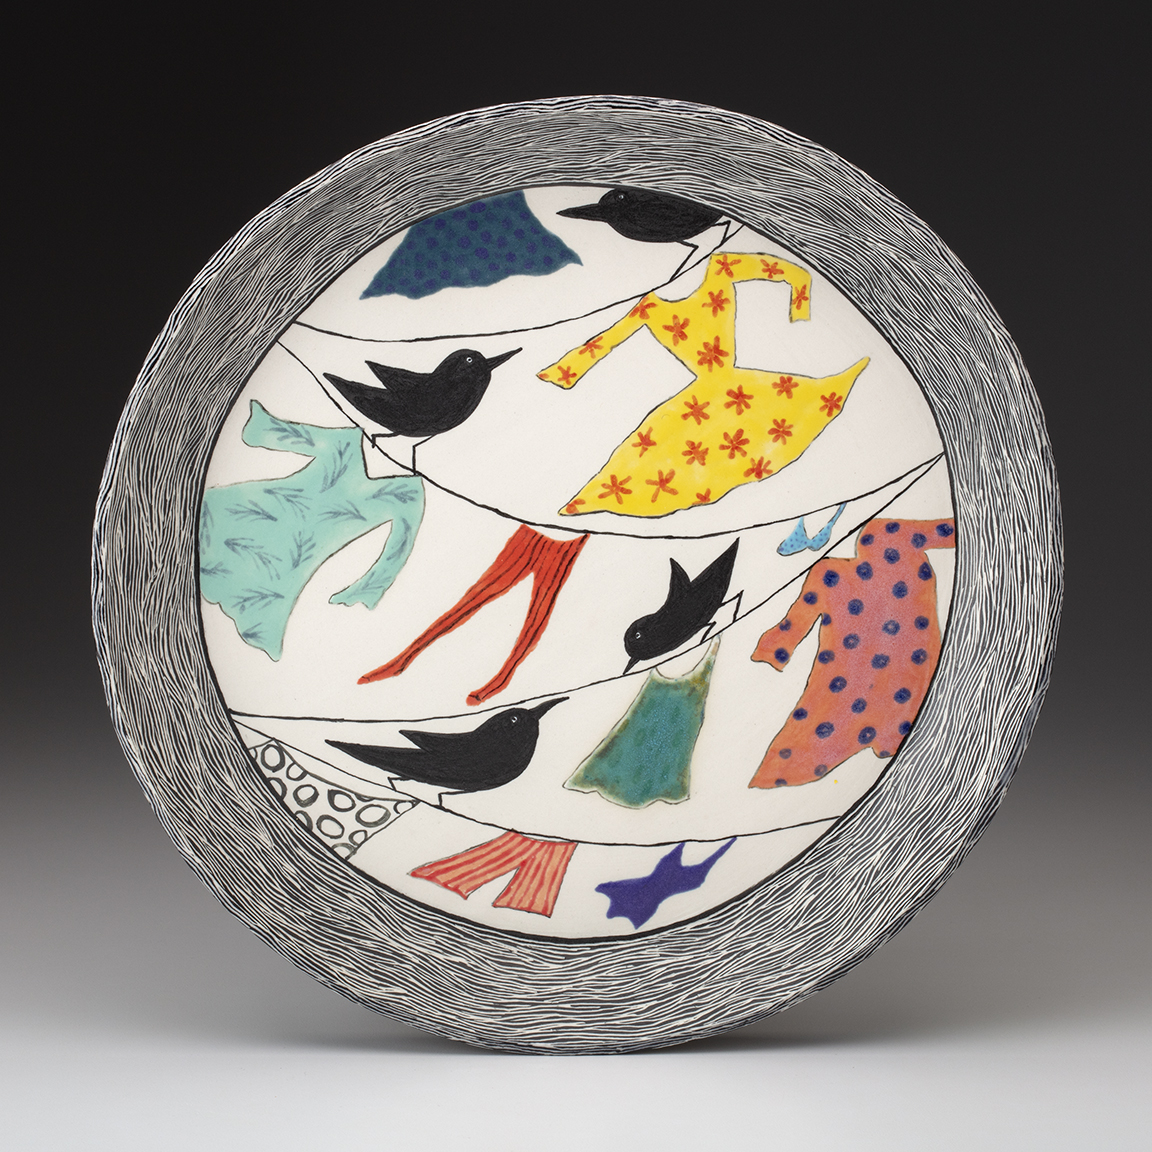 "Birds and Laundry plate, porcelain, sgraffito, glaze, 14.5"" x 1.5"""